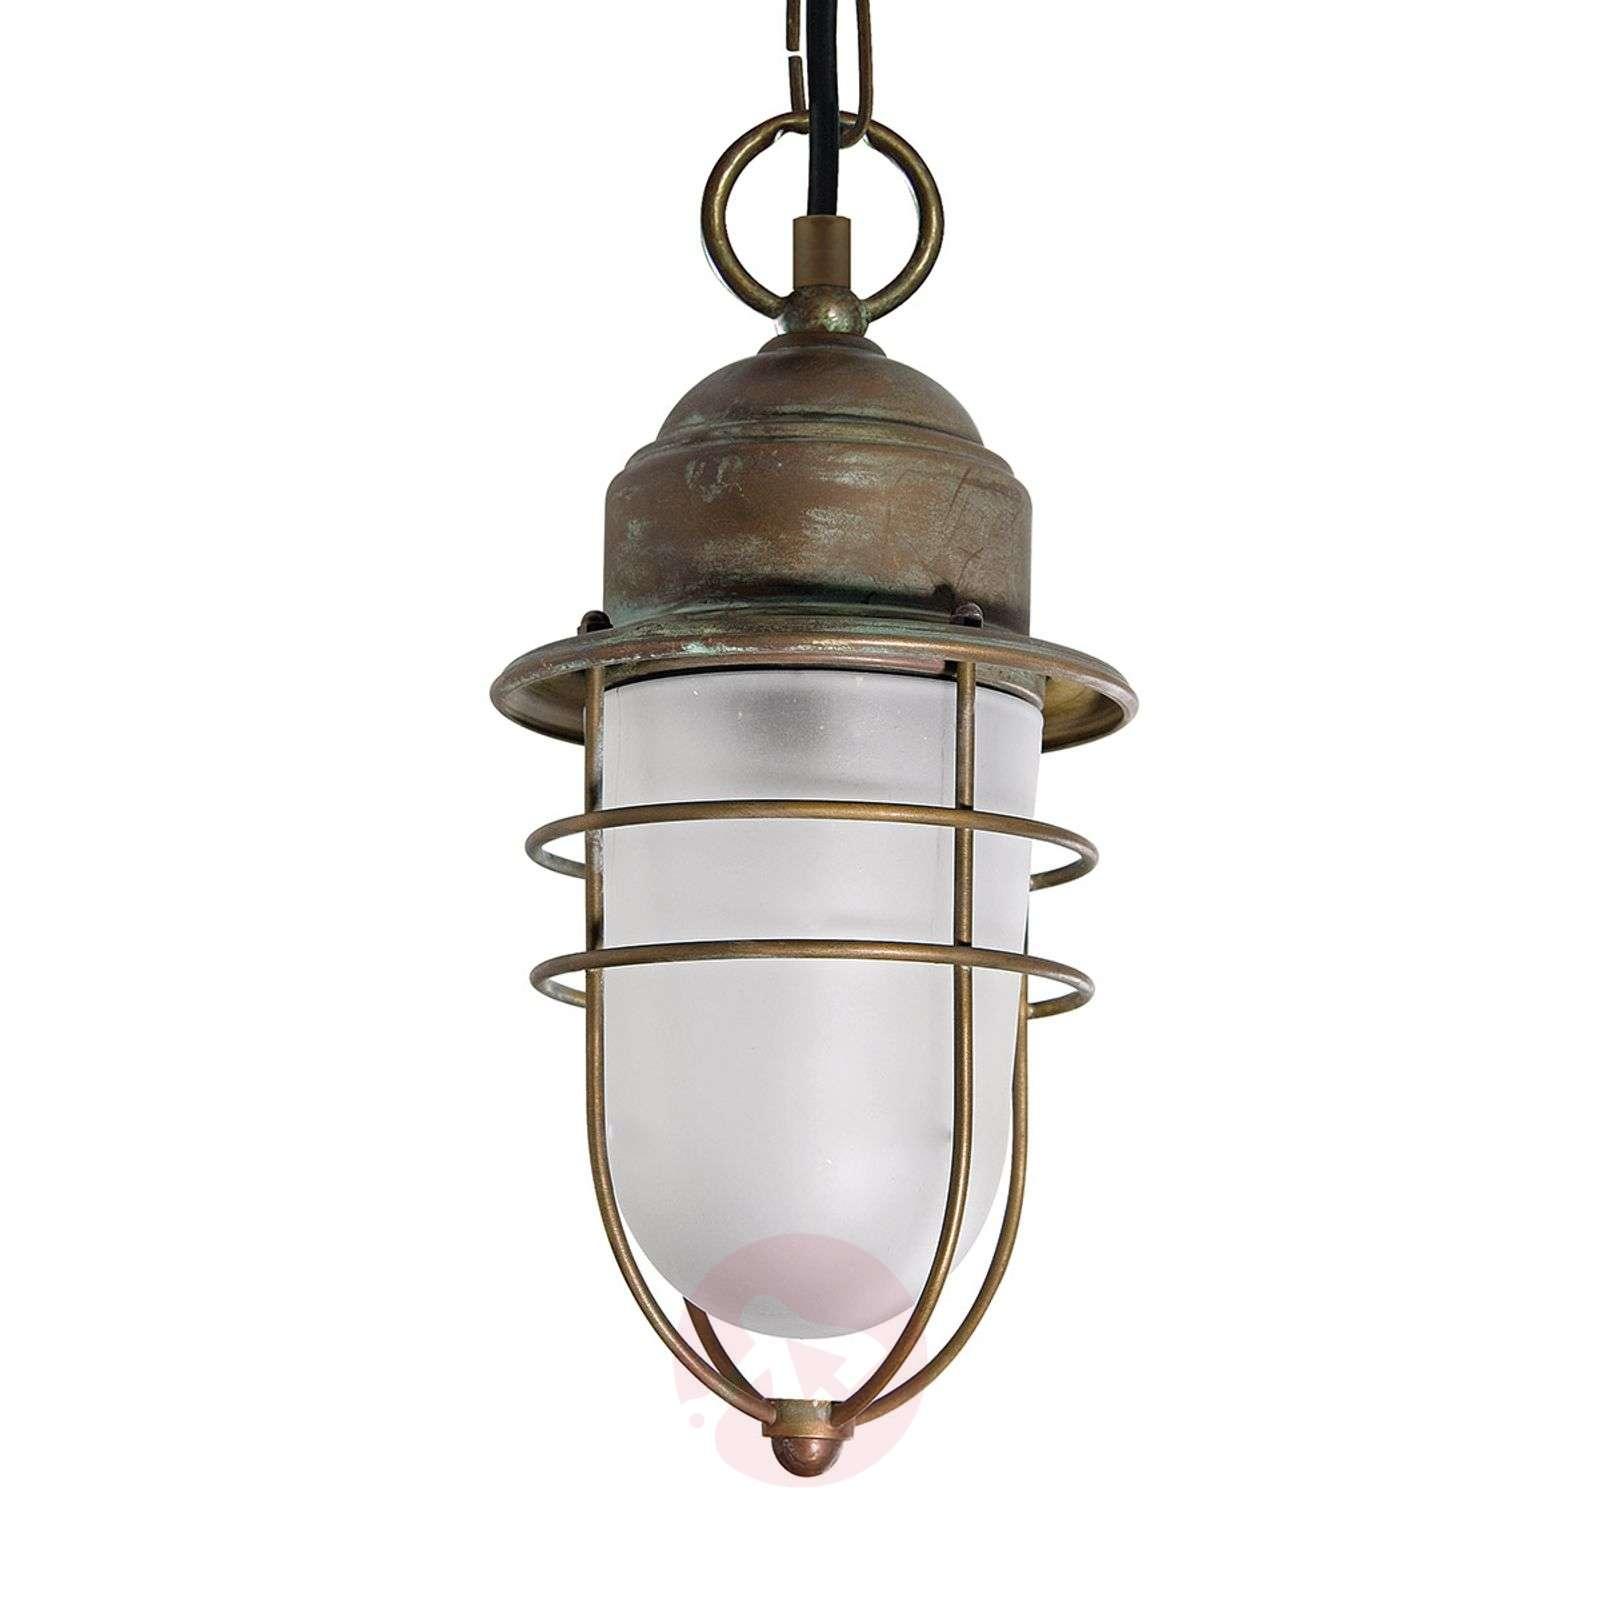 Seawater-resistant outdoor hanging light Matteo-6515215-01